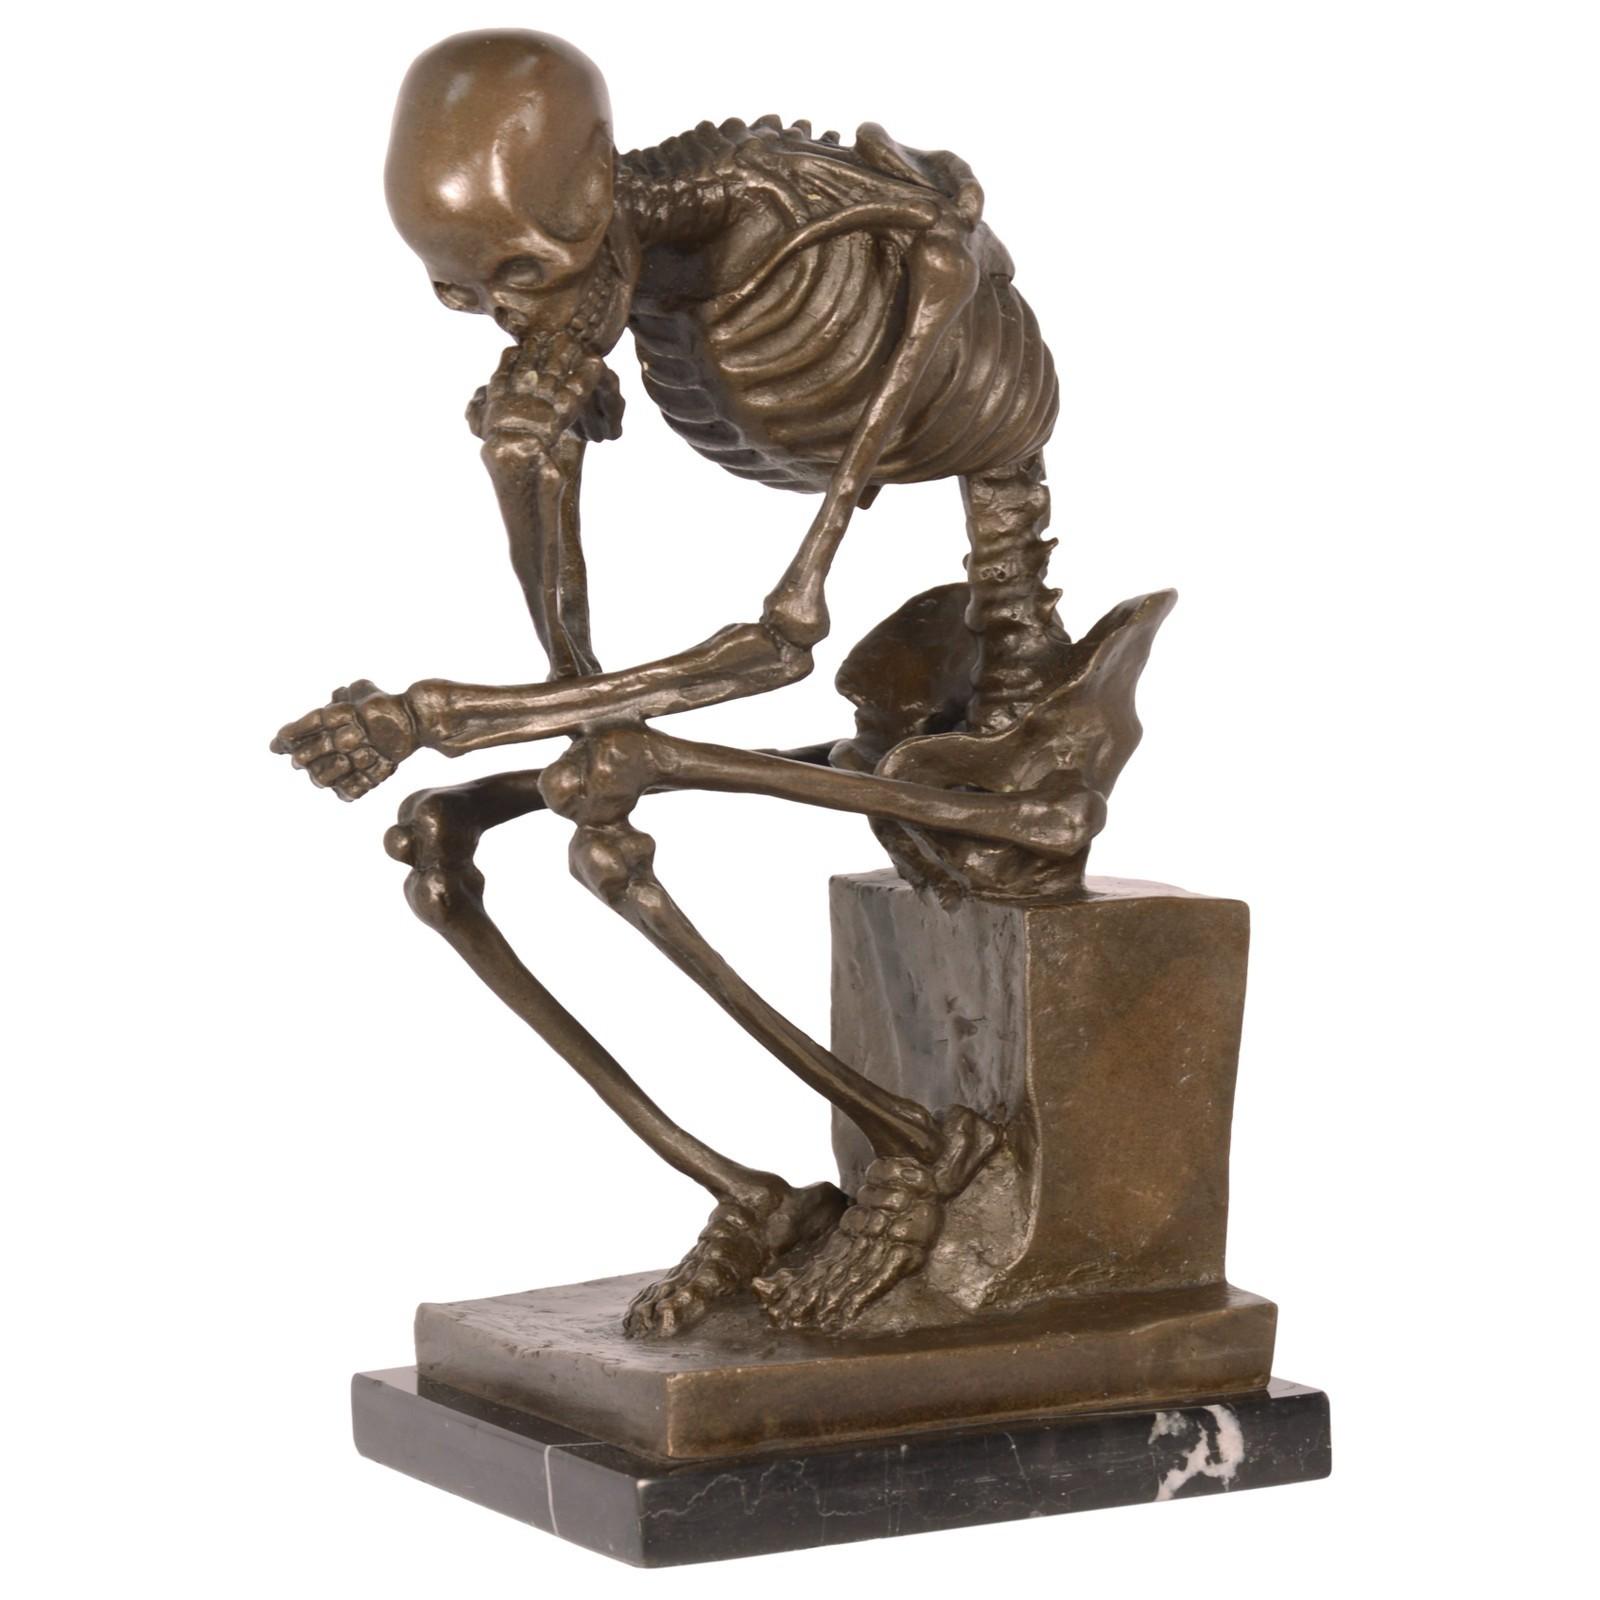 Skelett Bronzefigur Art Skulptur 24cm Marmorplatte Neuinterpretation ...